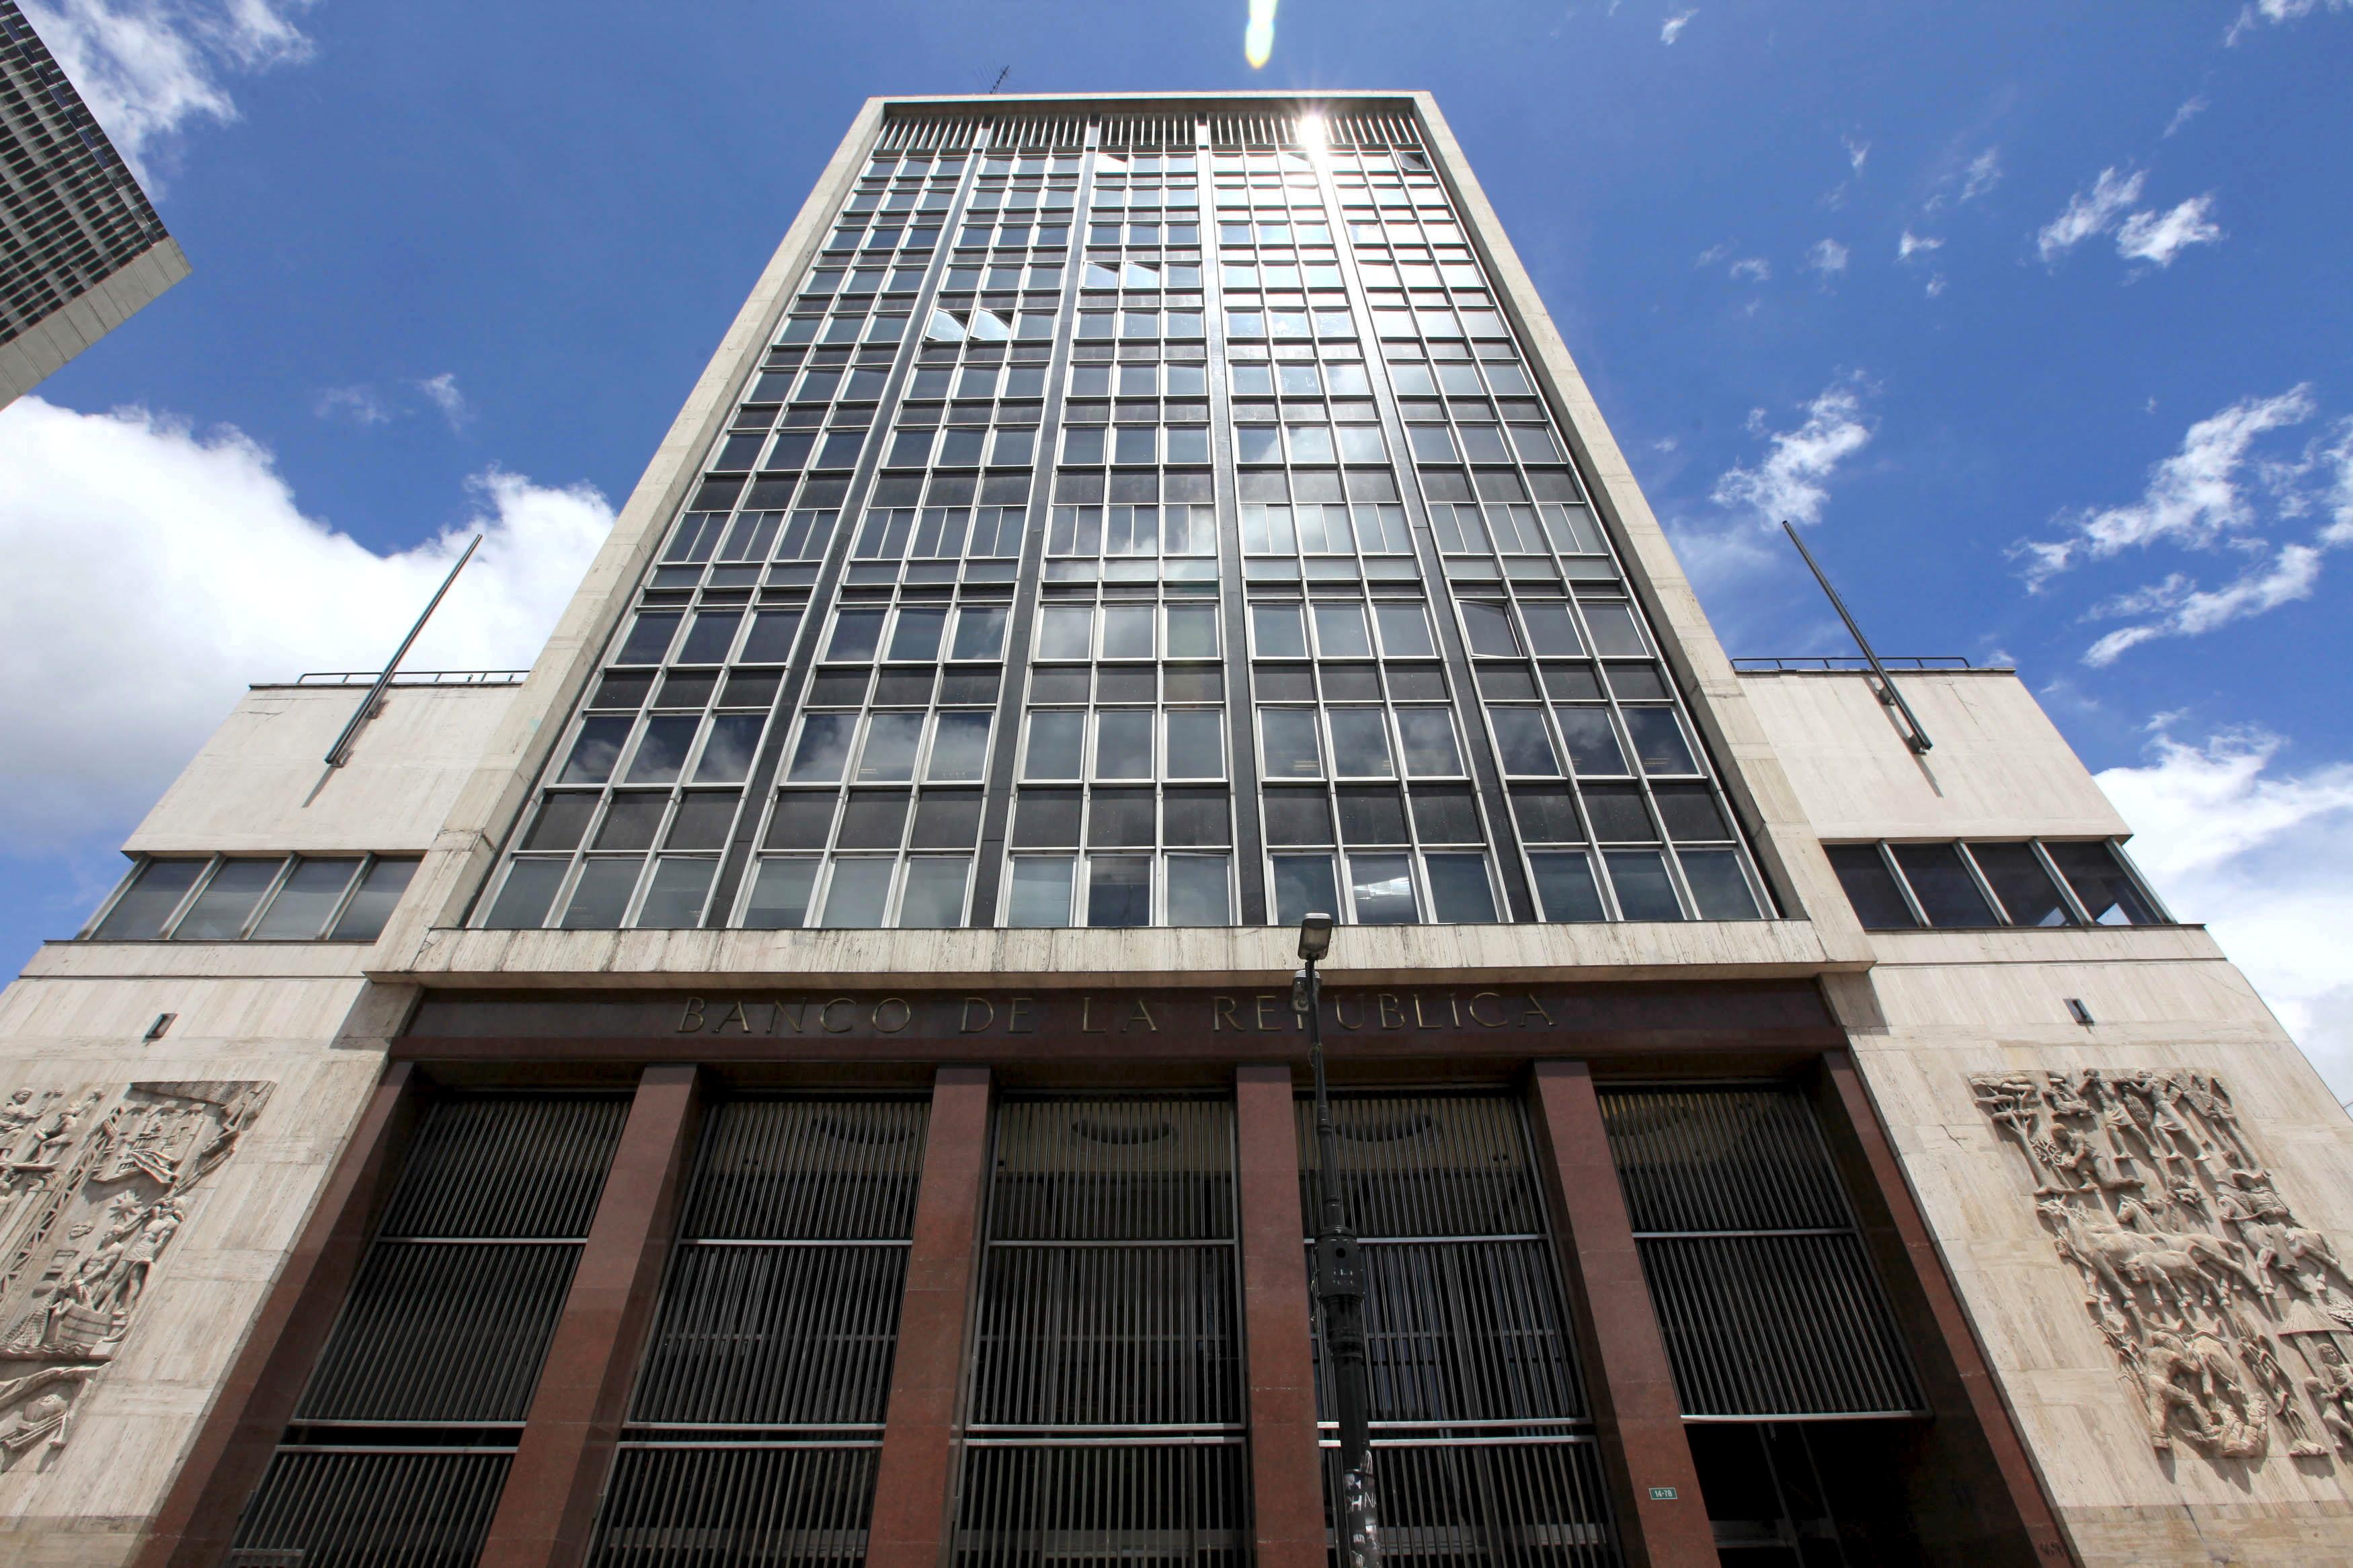 General view of Colombia's central bank (Banco de la Republica) in Bogota April 7, 2015. REUTERS/Jose Miguel Gomez/File Photo